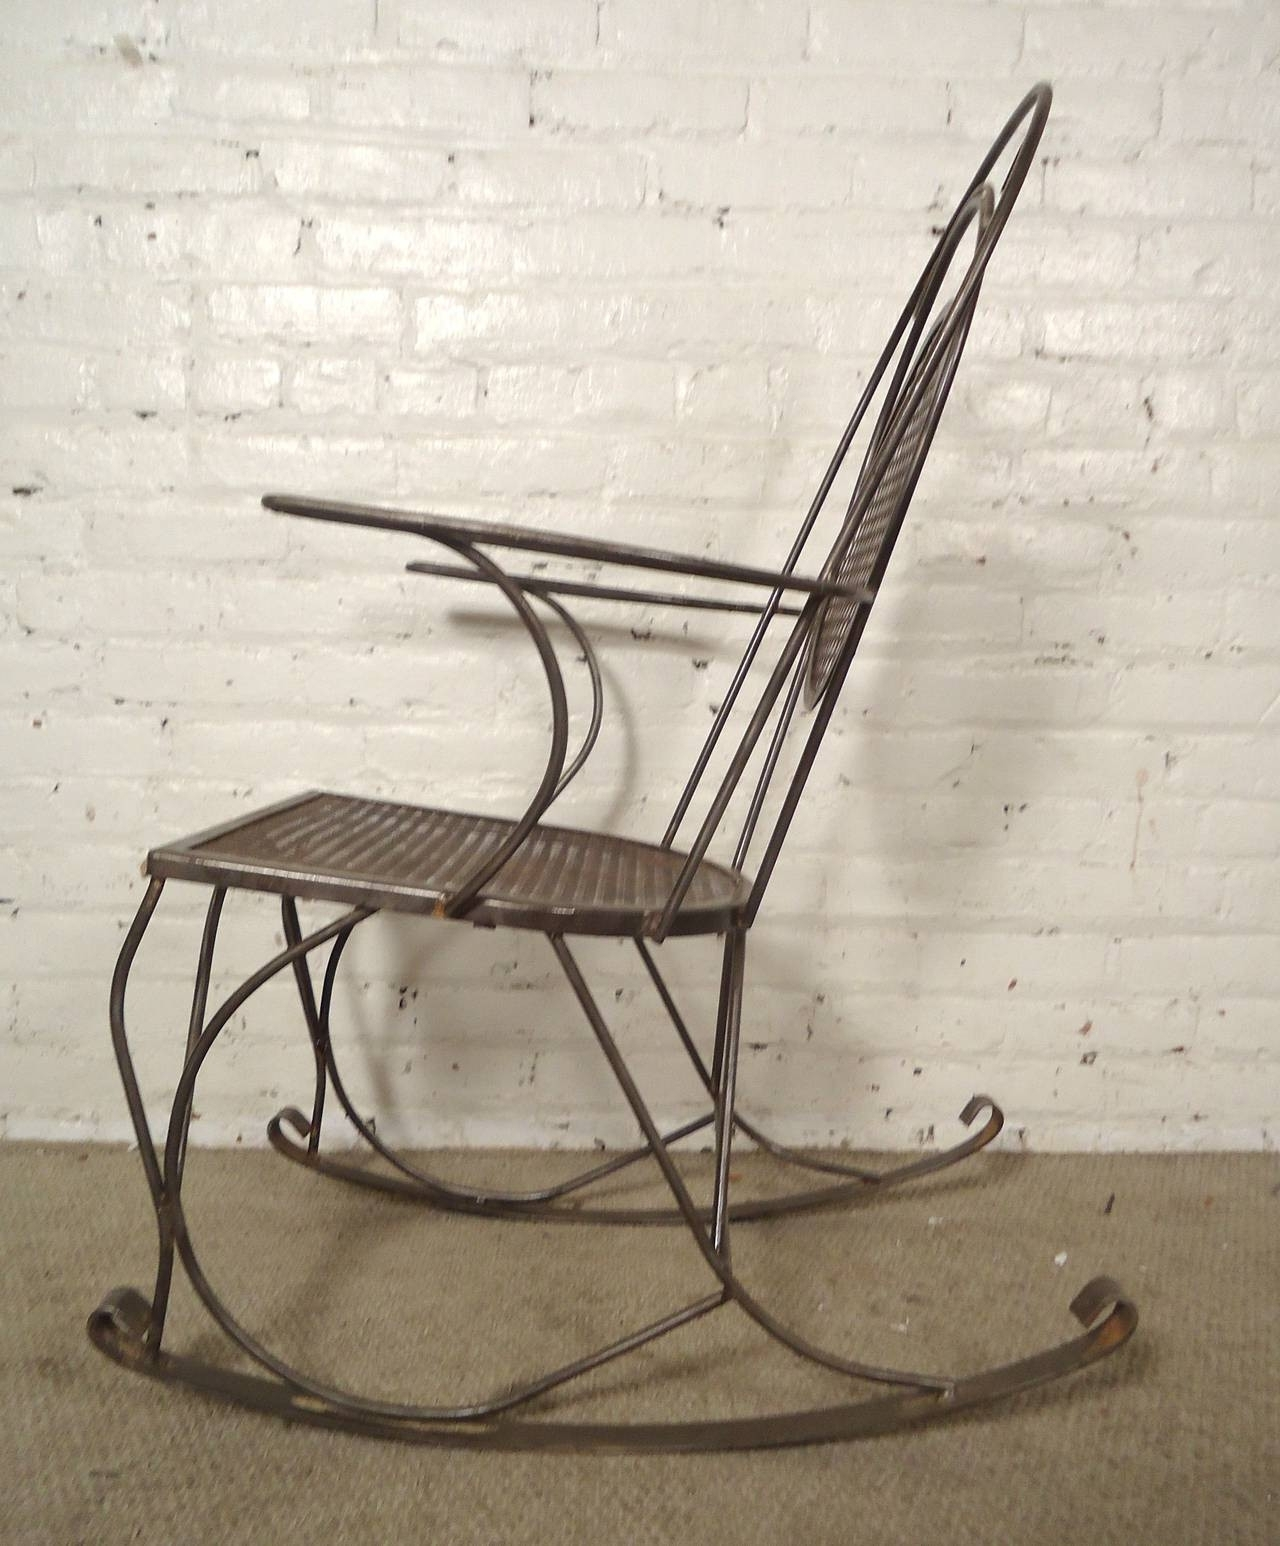 Vintage Metal Outdoor Rocking Chairs Outdoor Designs Design Of Regarding Most Recently Released Outdoor Patio Metal Rocking Chairs (View 11 of 15)